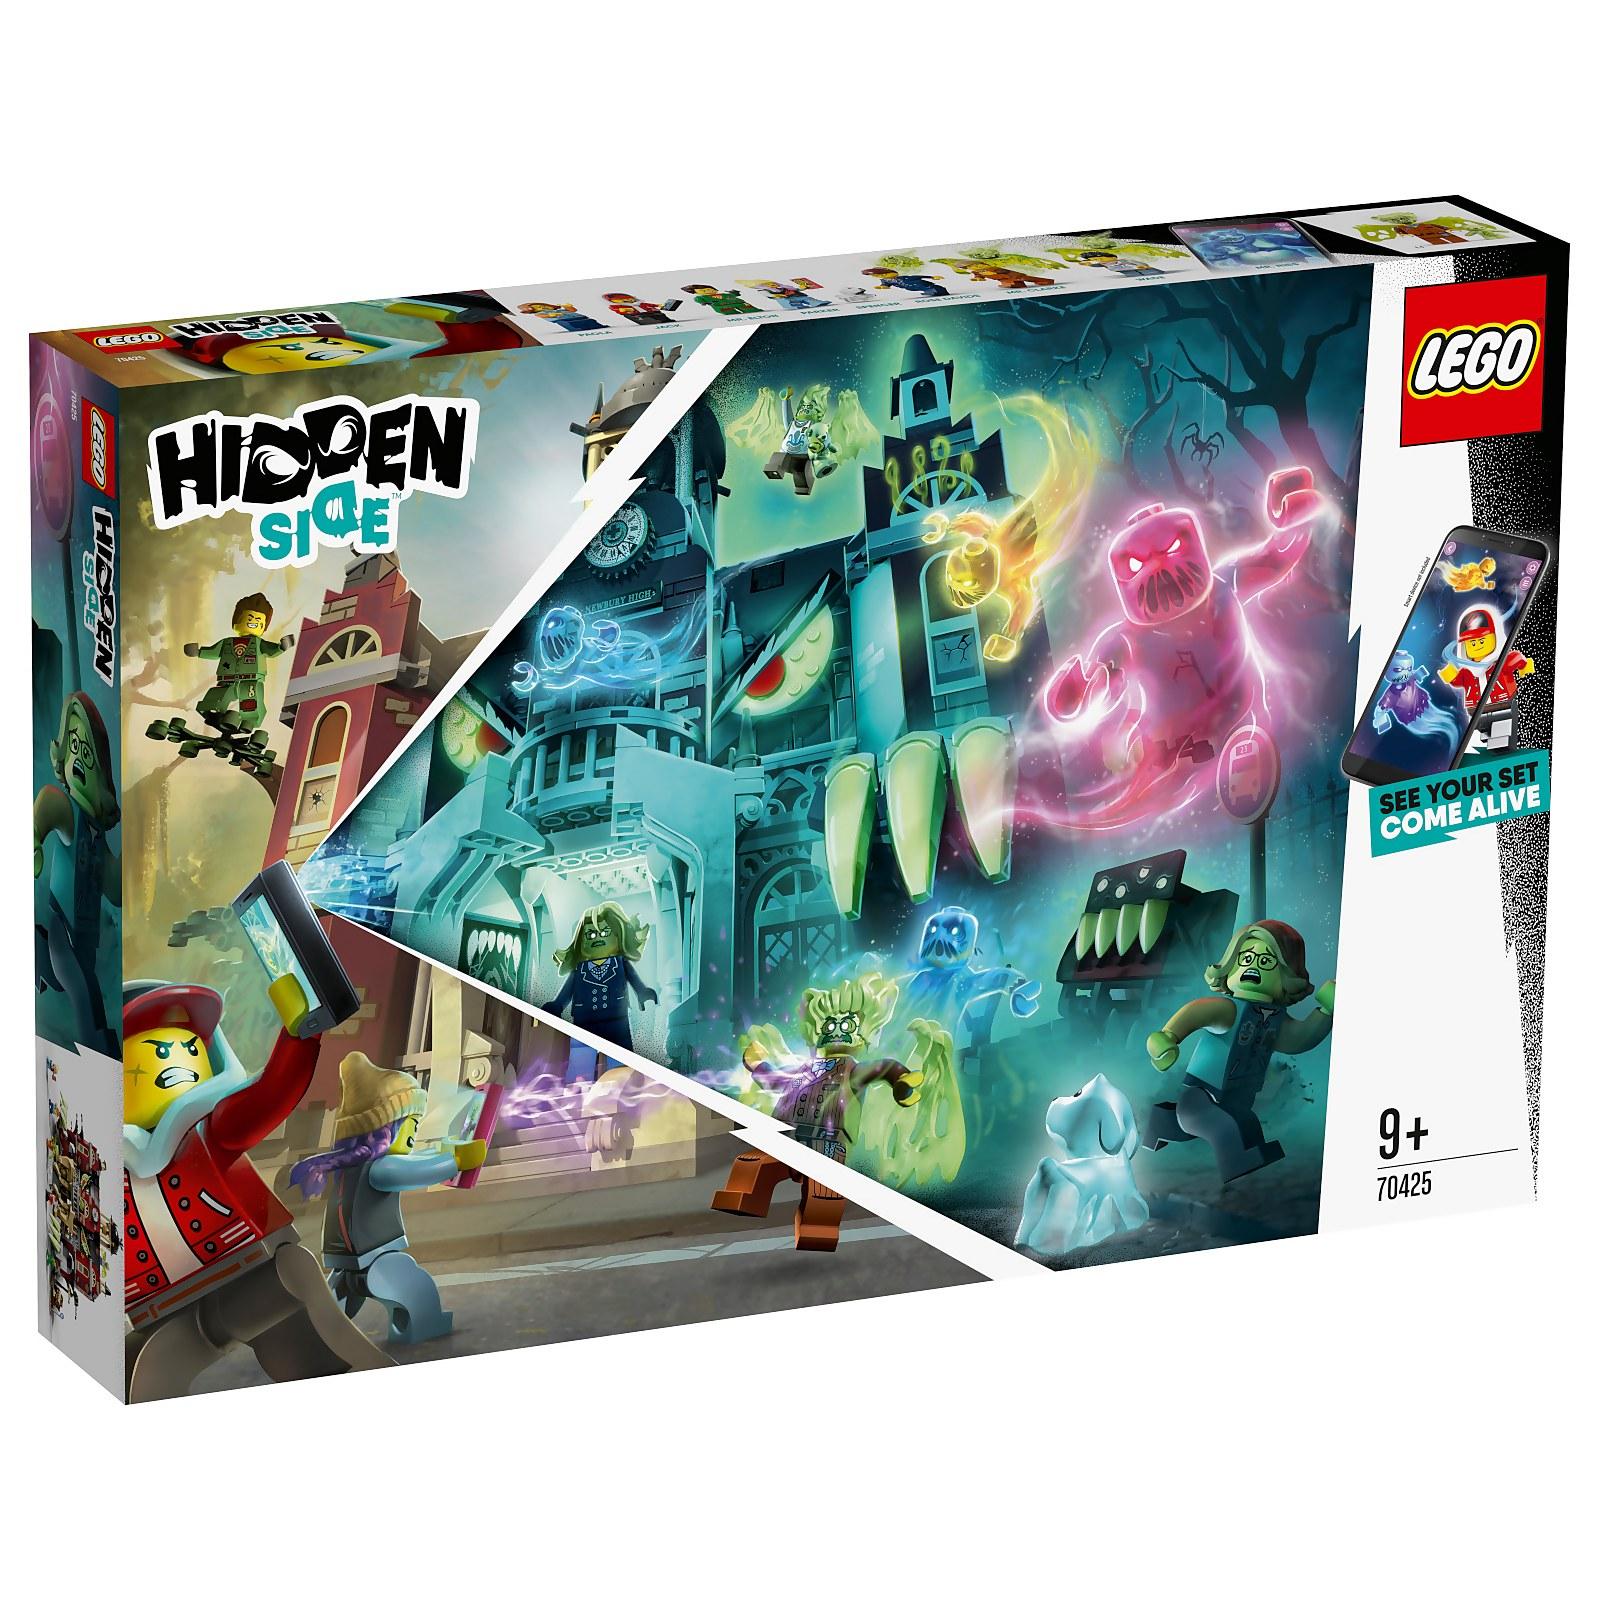 Image of LEGO The Hidden Side: Newbury Haunted High School (70425)